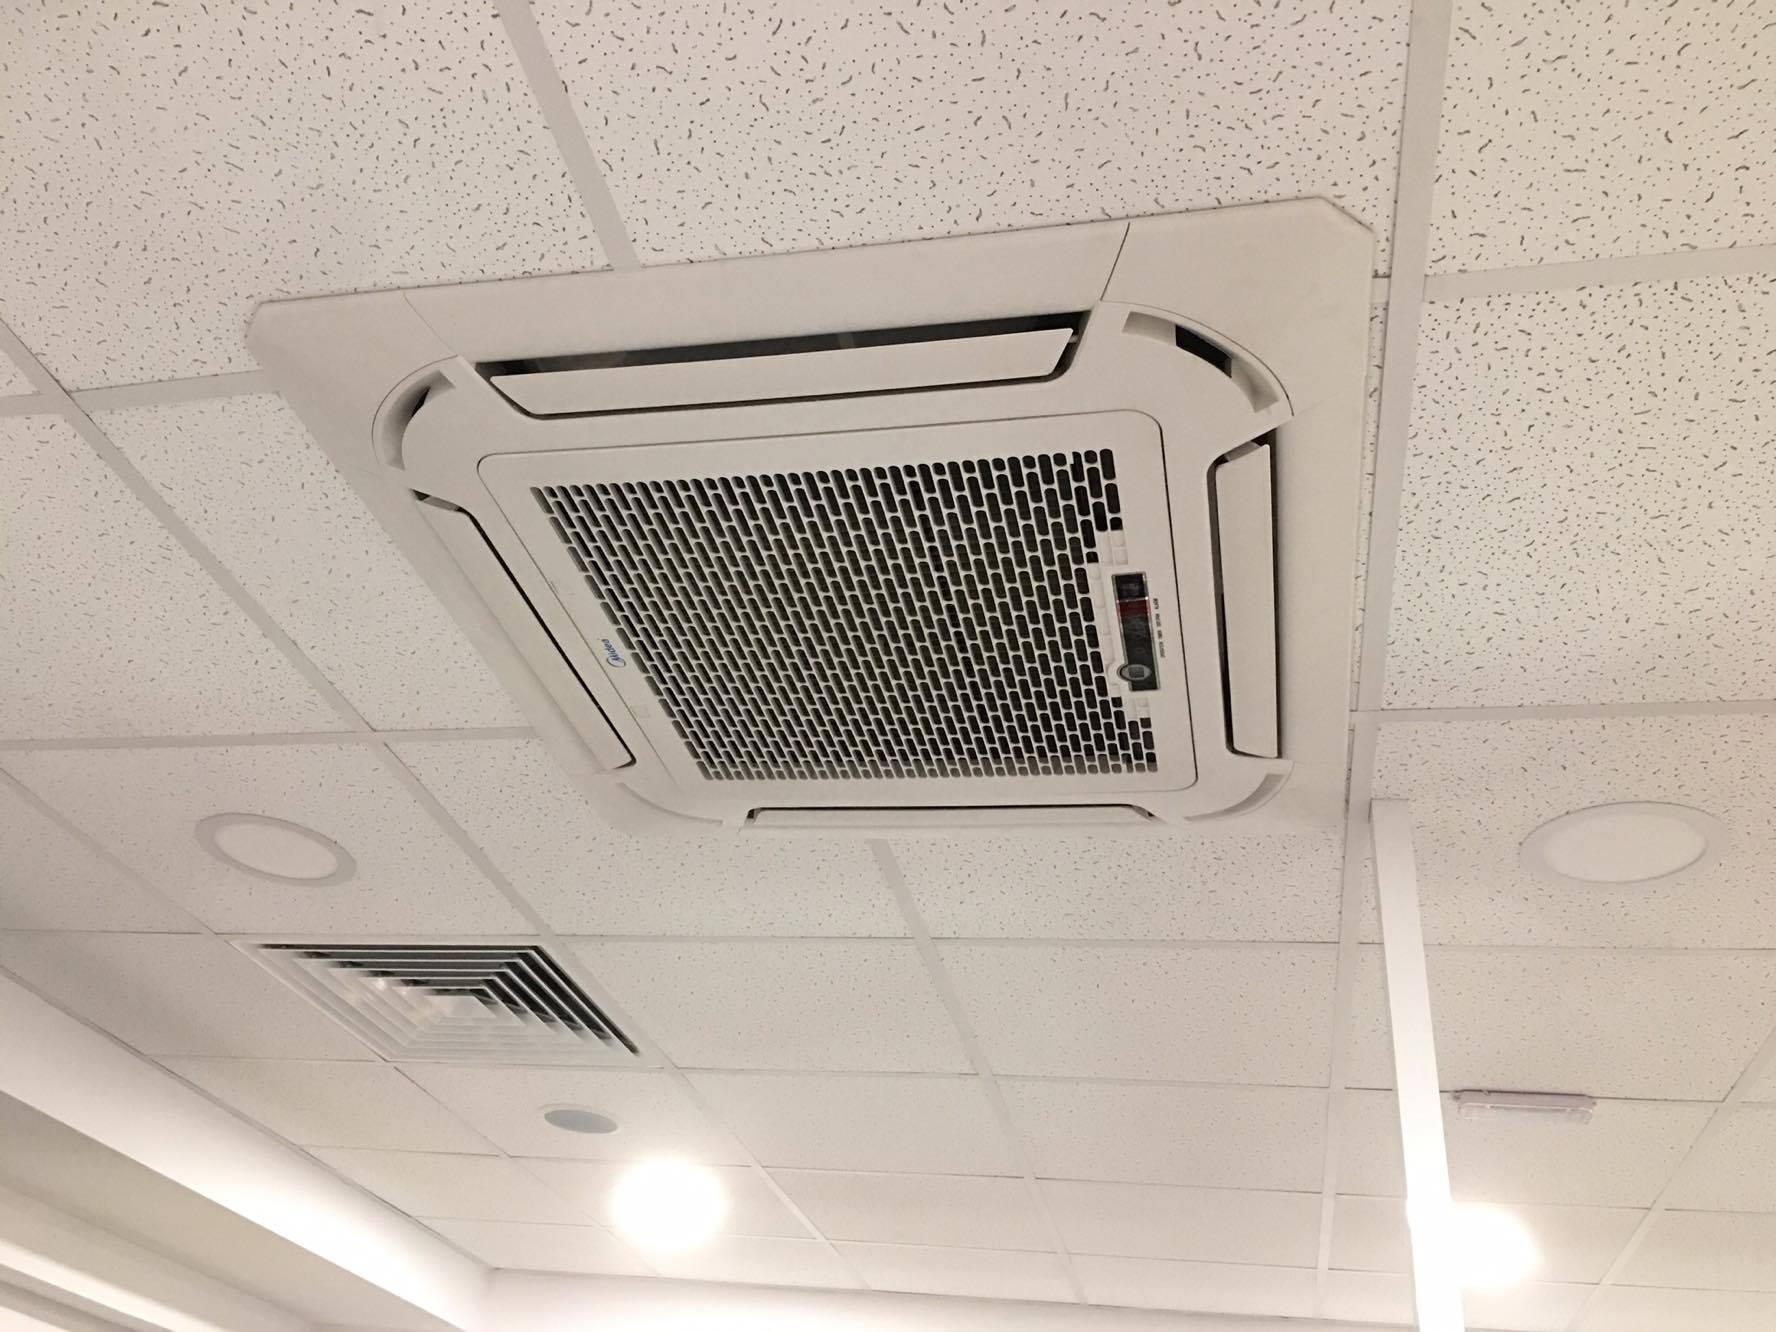 vytreshni-tela-klimatizaciq-magazin-3-atanasovclima-ltd